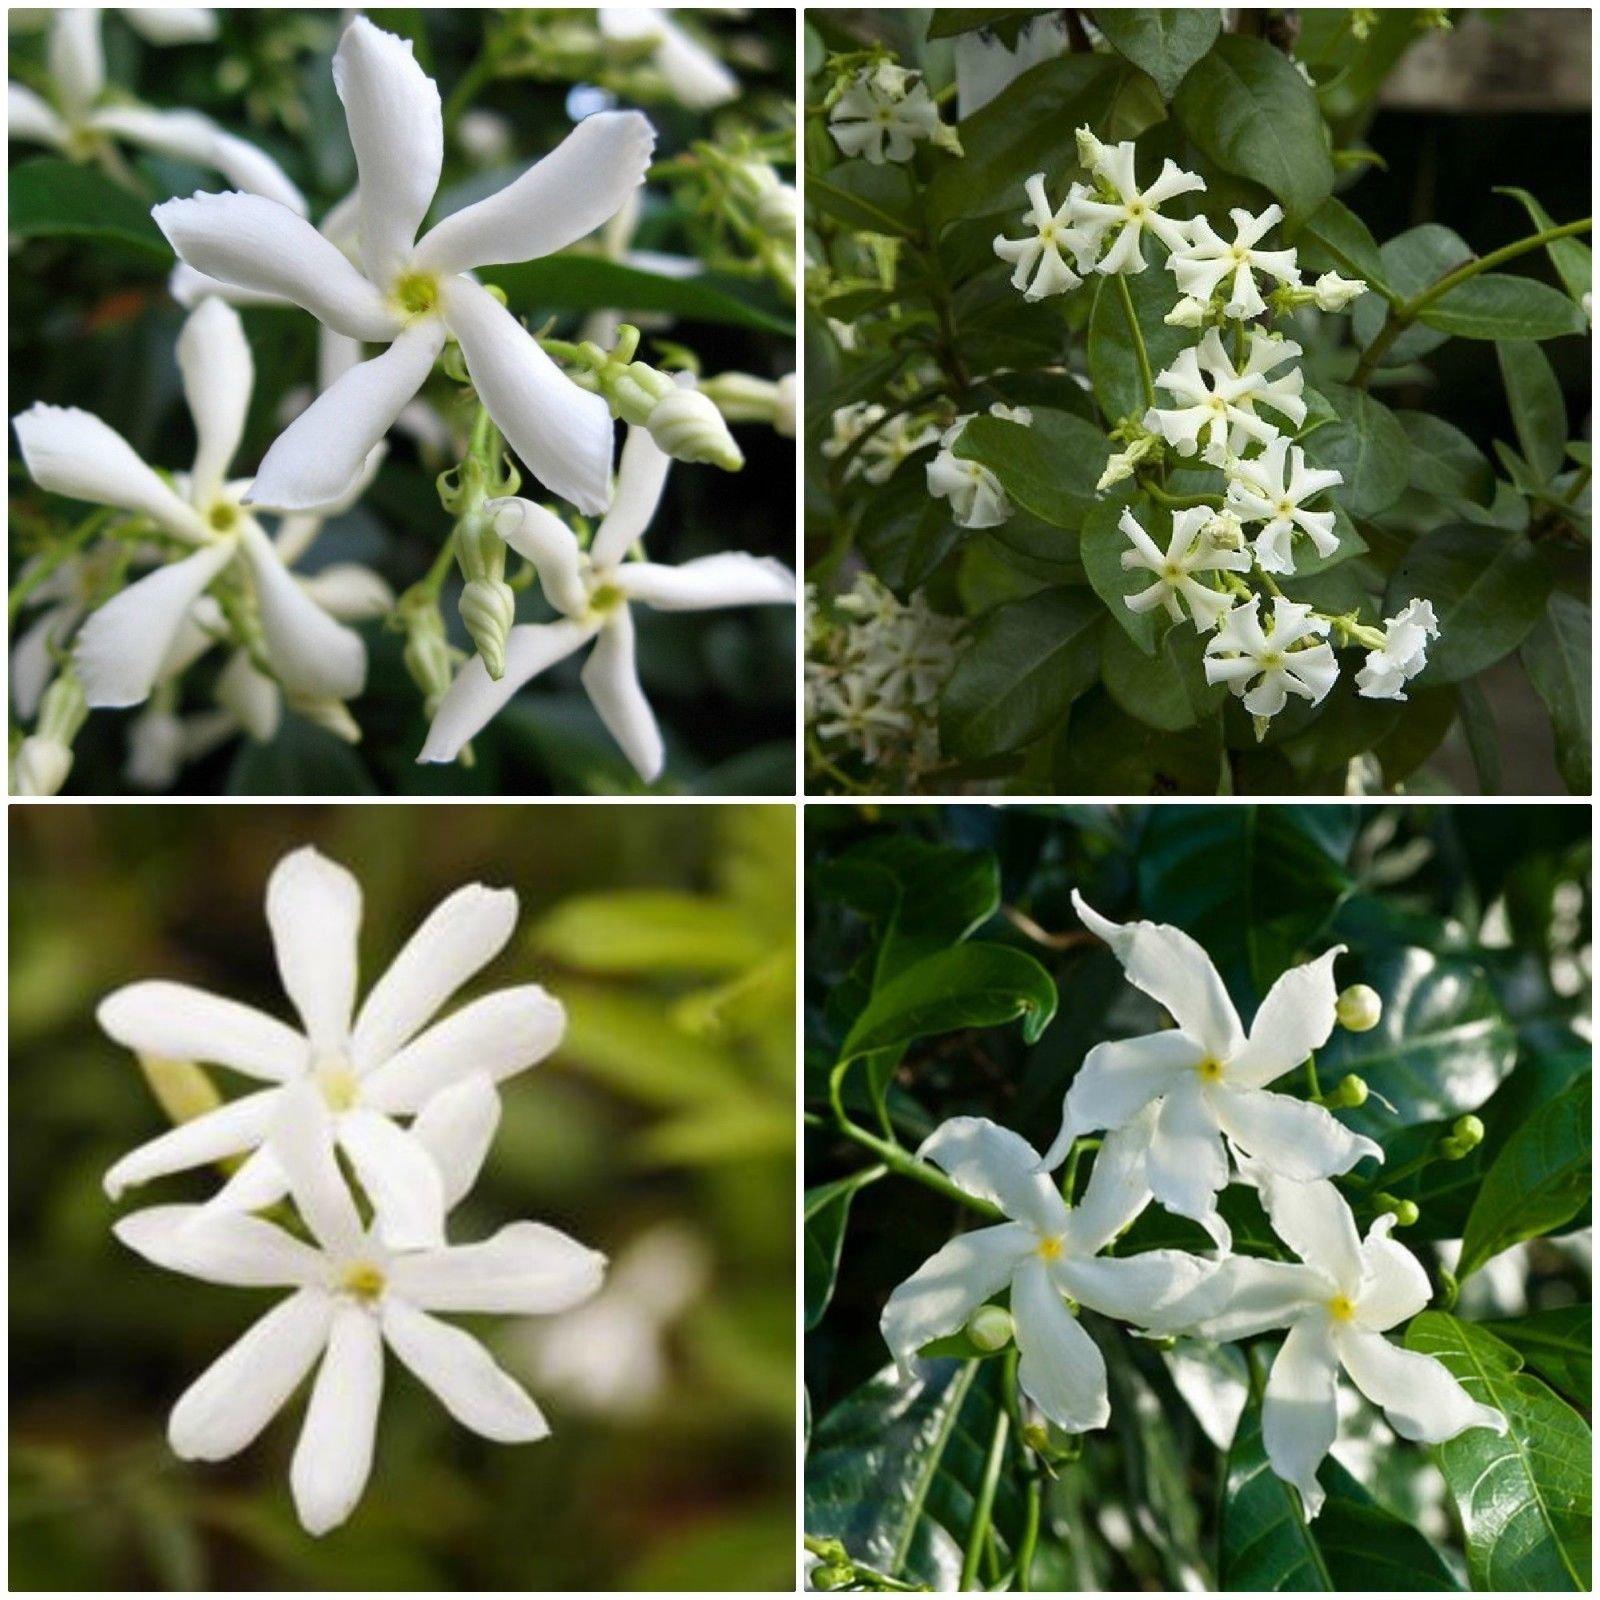 2 Confederate Jasmine Star Fragrant Jasmine vine !! Live Rooted Plant 8'' to 12''